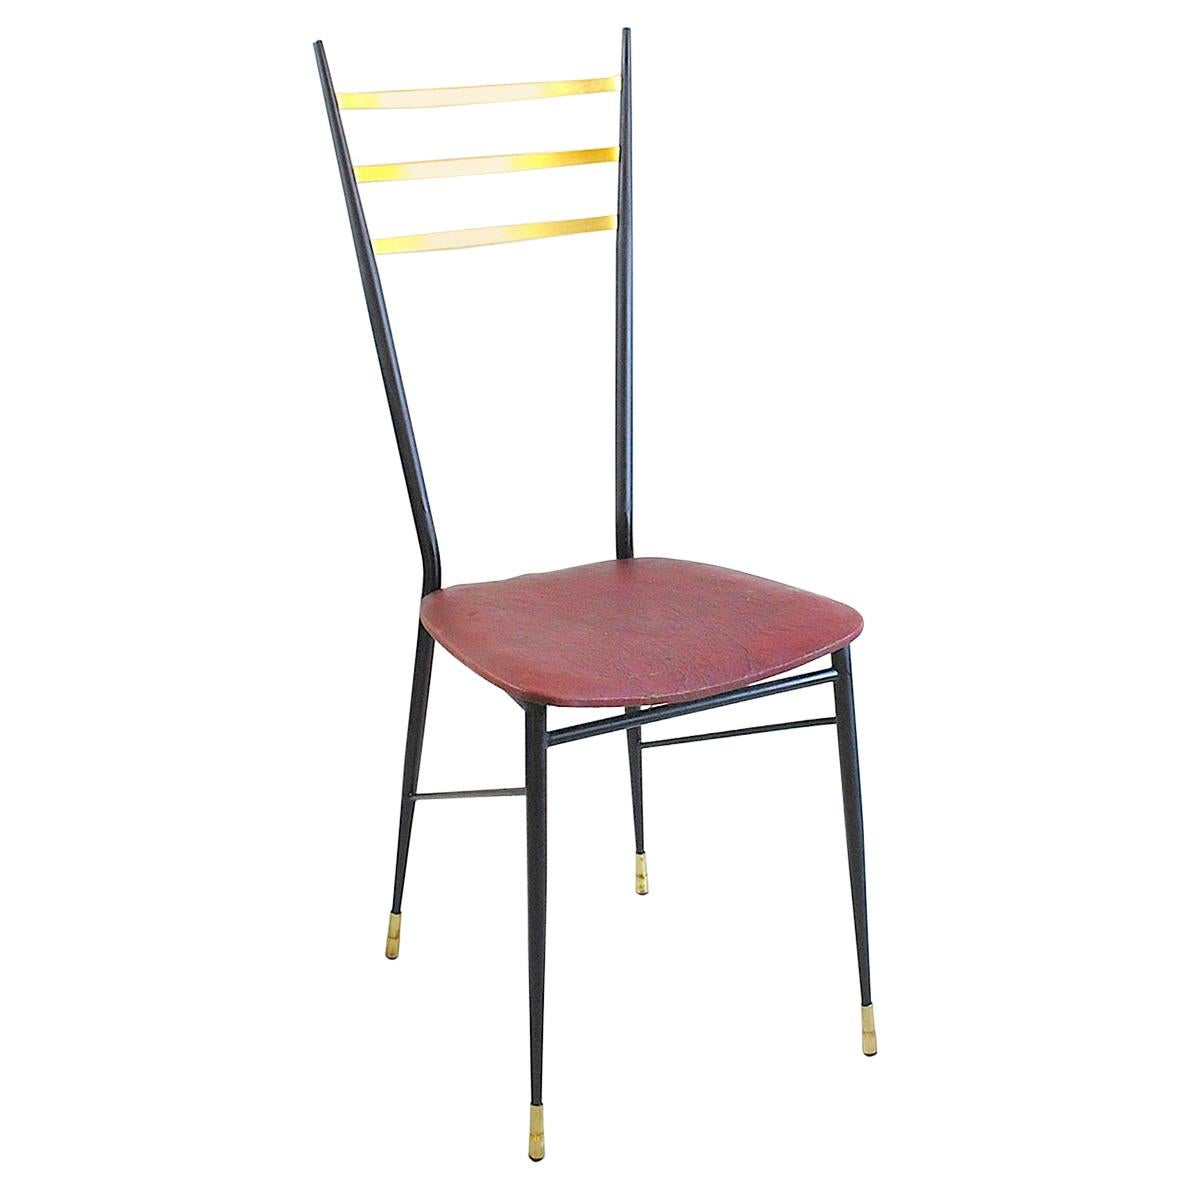 Italian Midcentury Chair in Brass